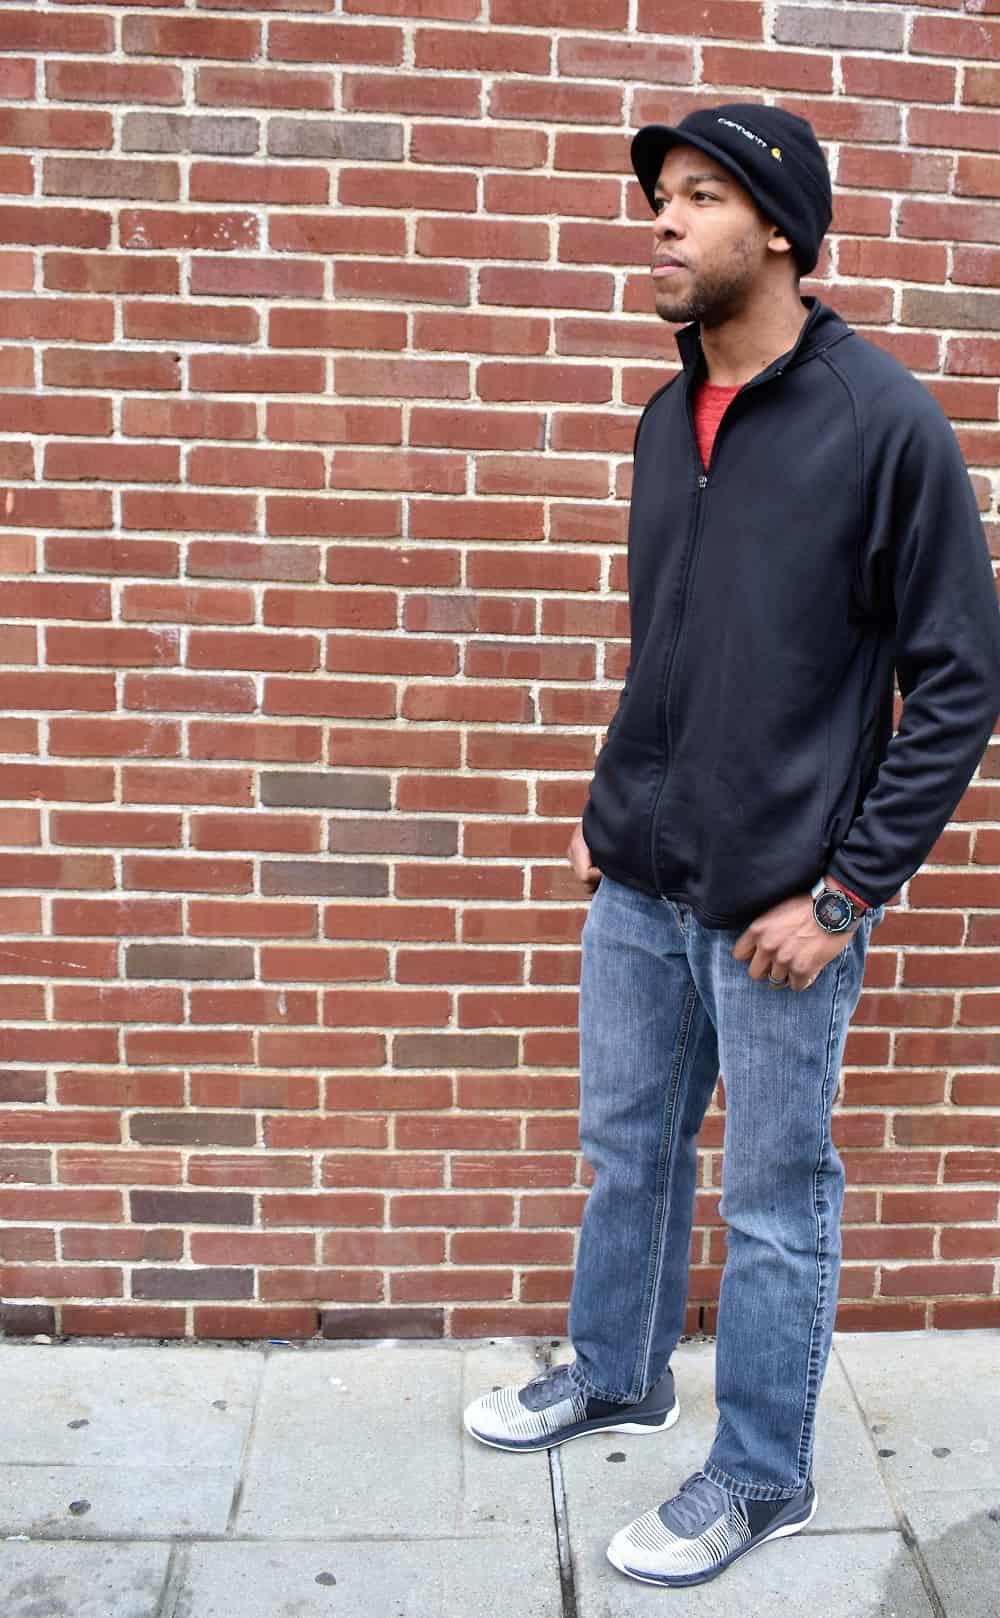 Man wearing a black shirt, jeans, and Reebok Fast Flexweave sneakers